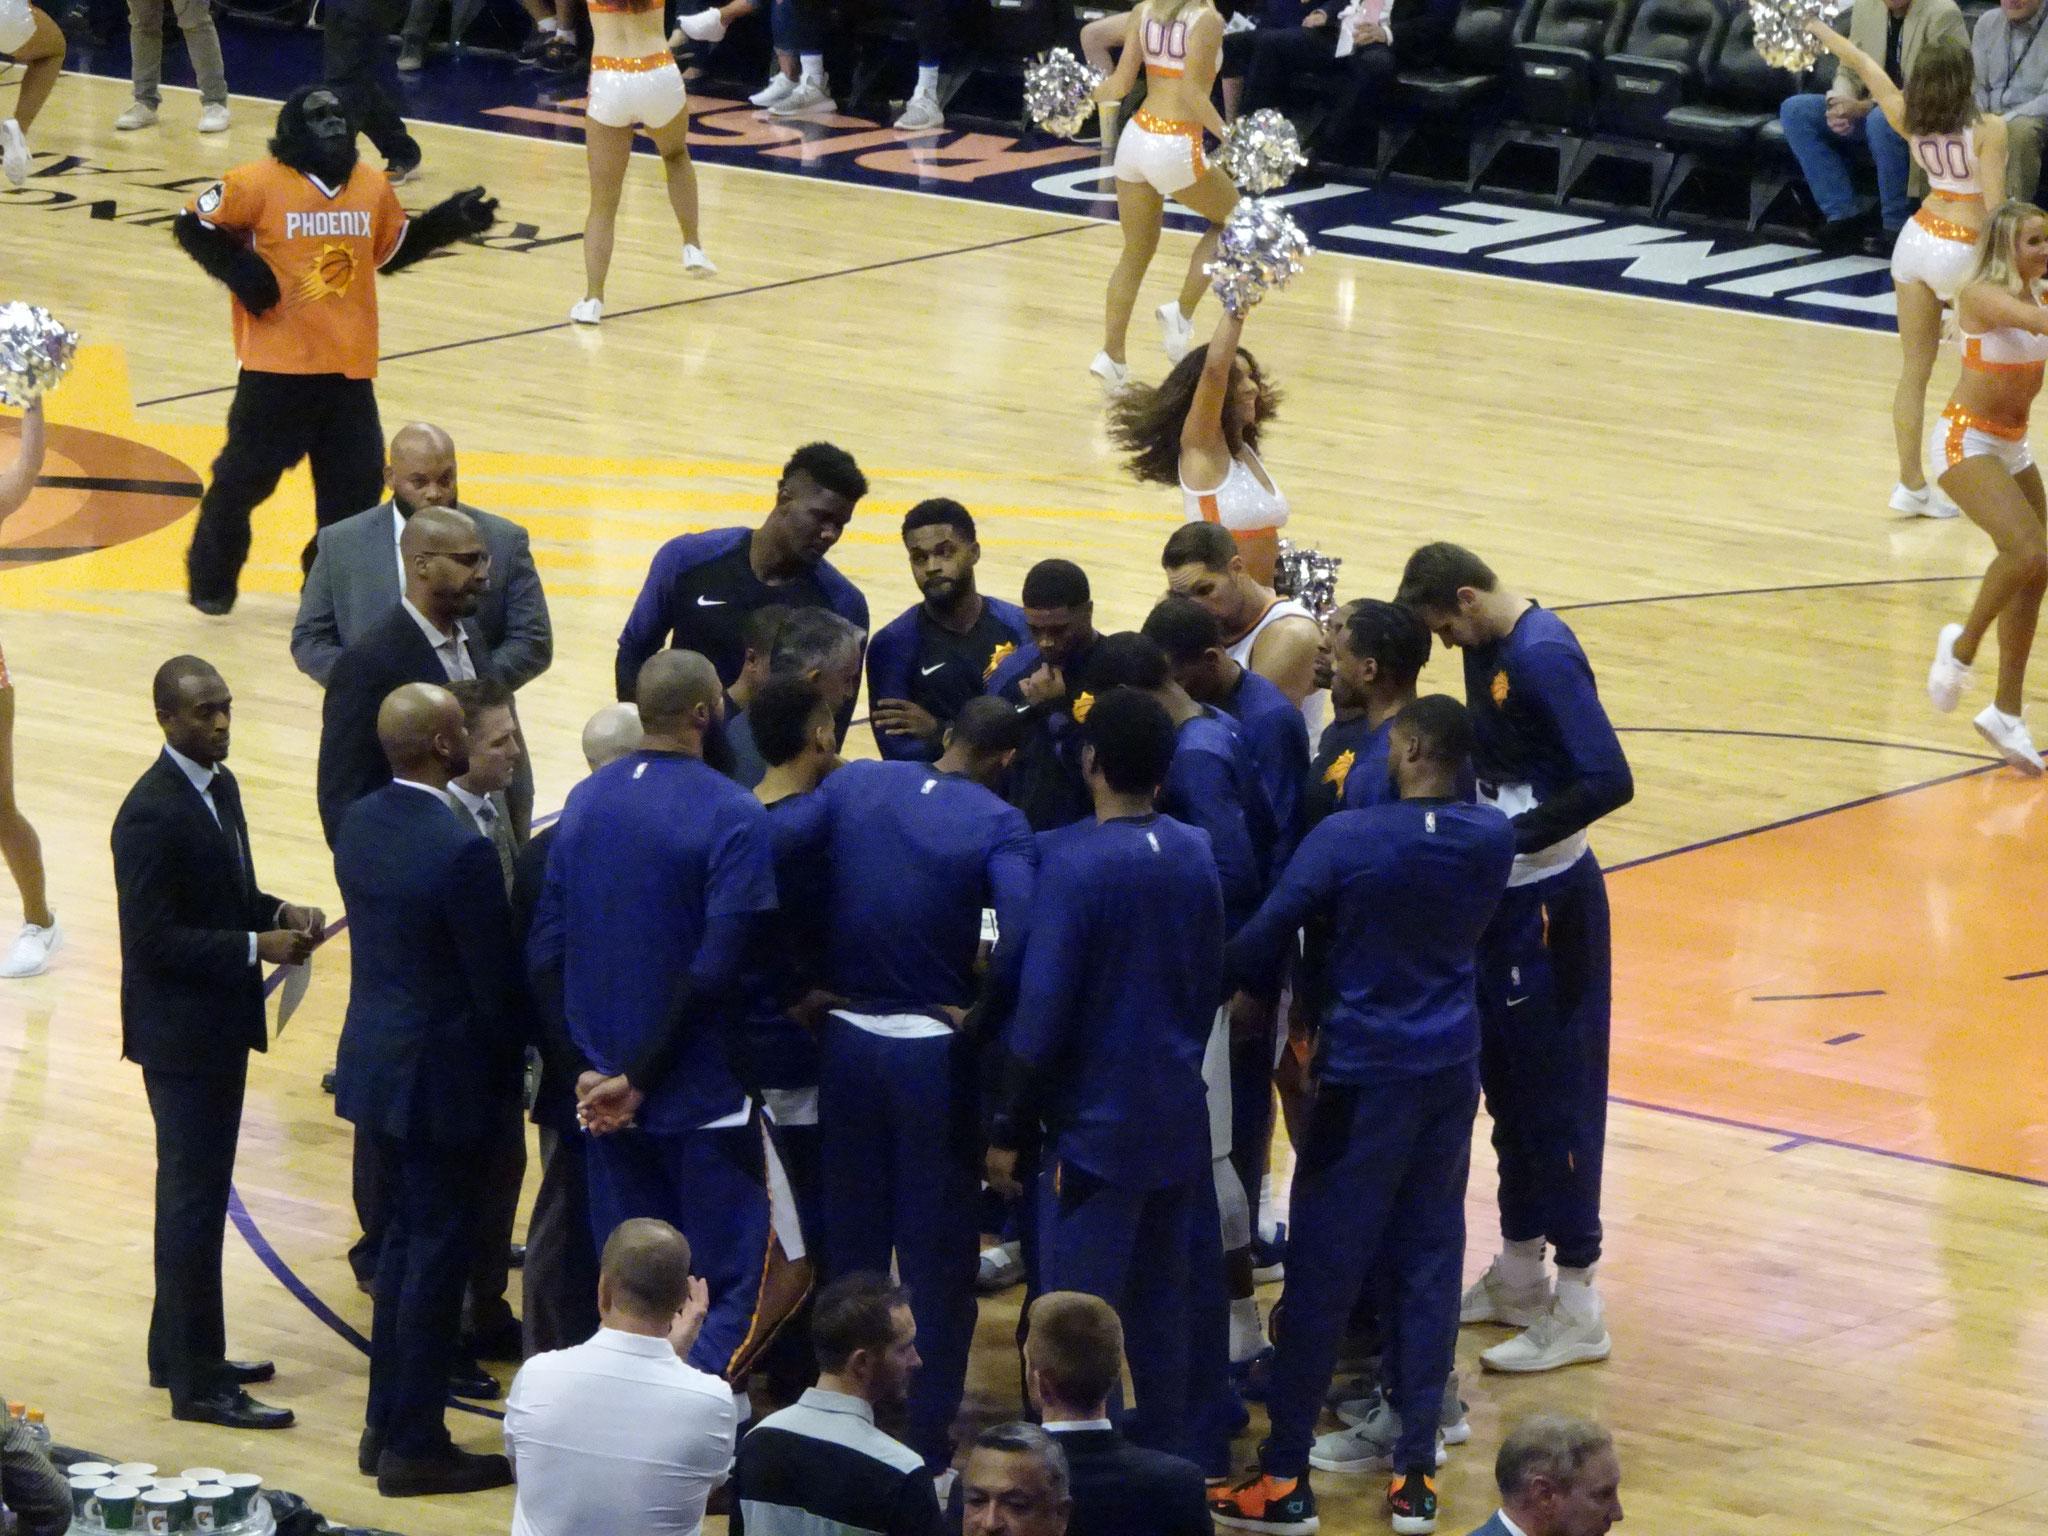 Phoenix Suns vs Portland Trailblazers (2018/19)